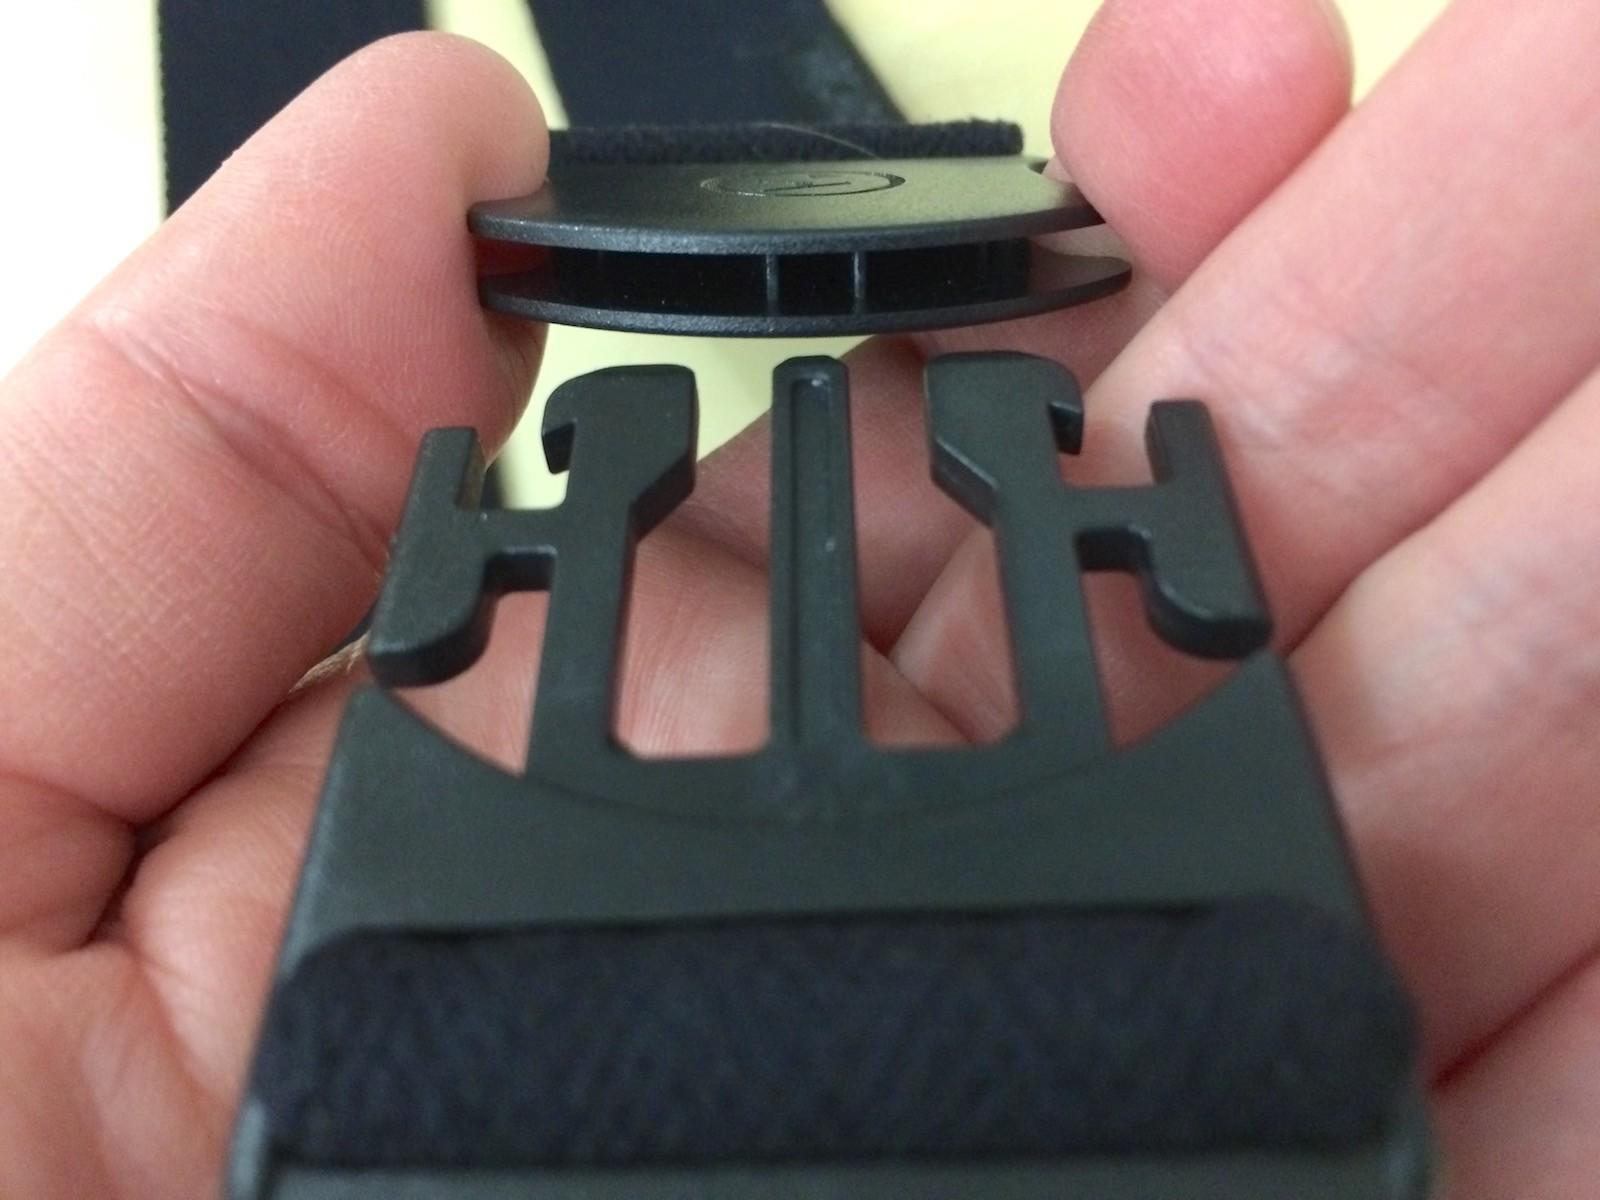 Arcade Belt buckle insertion problem